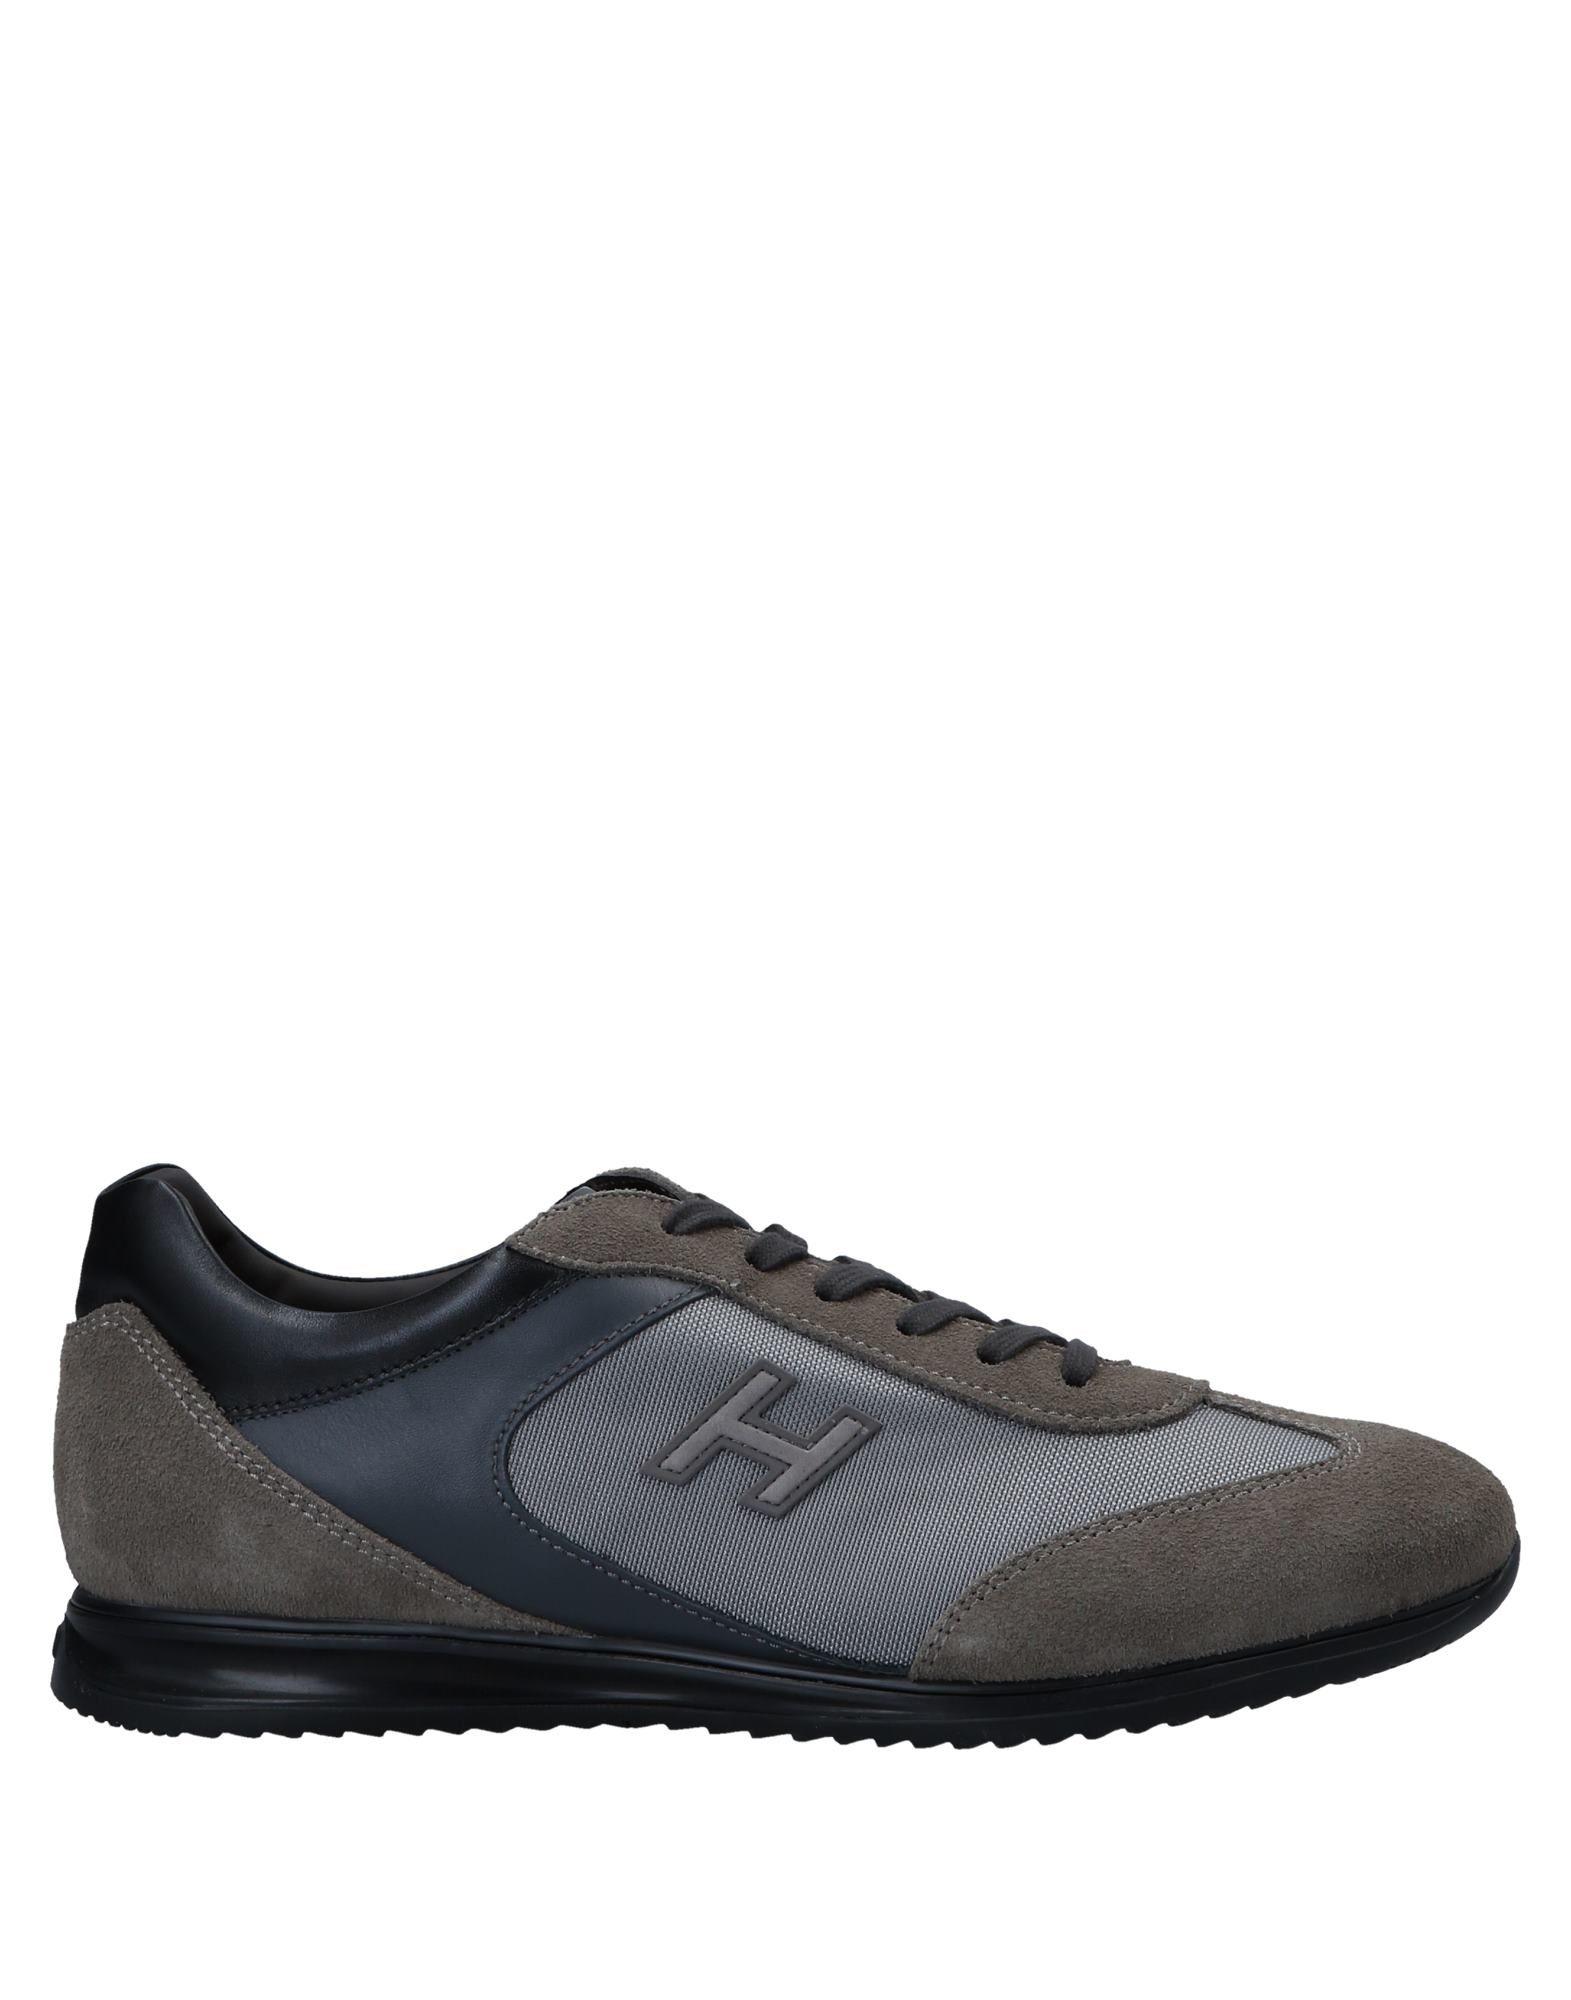 Hogan Sneakers Herren  11556017LE Gute Qualität beliebte Schuhe